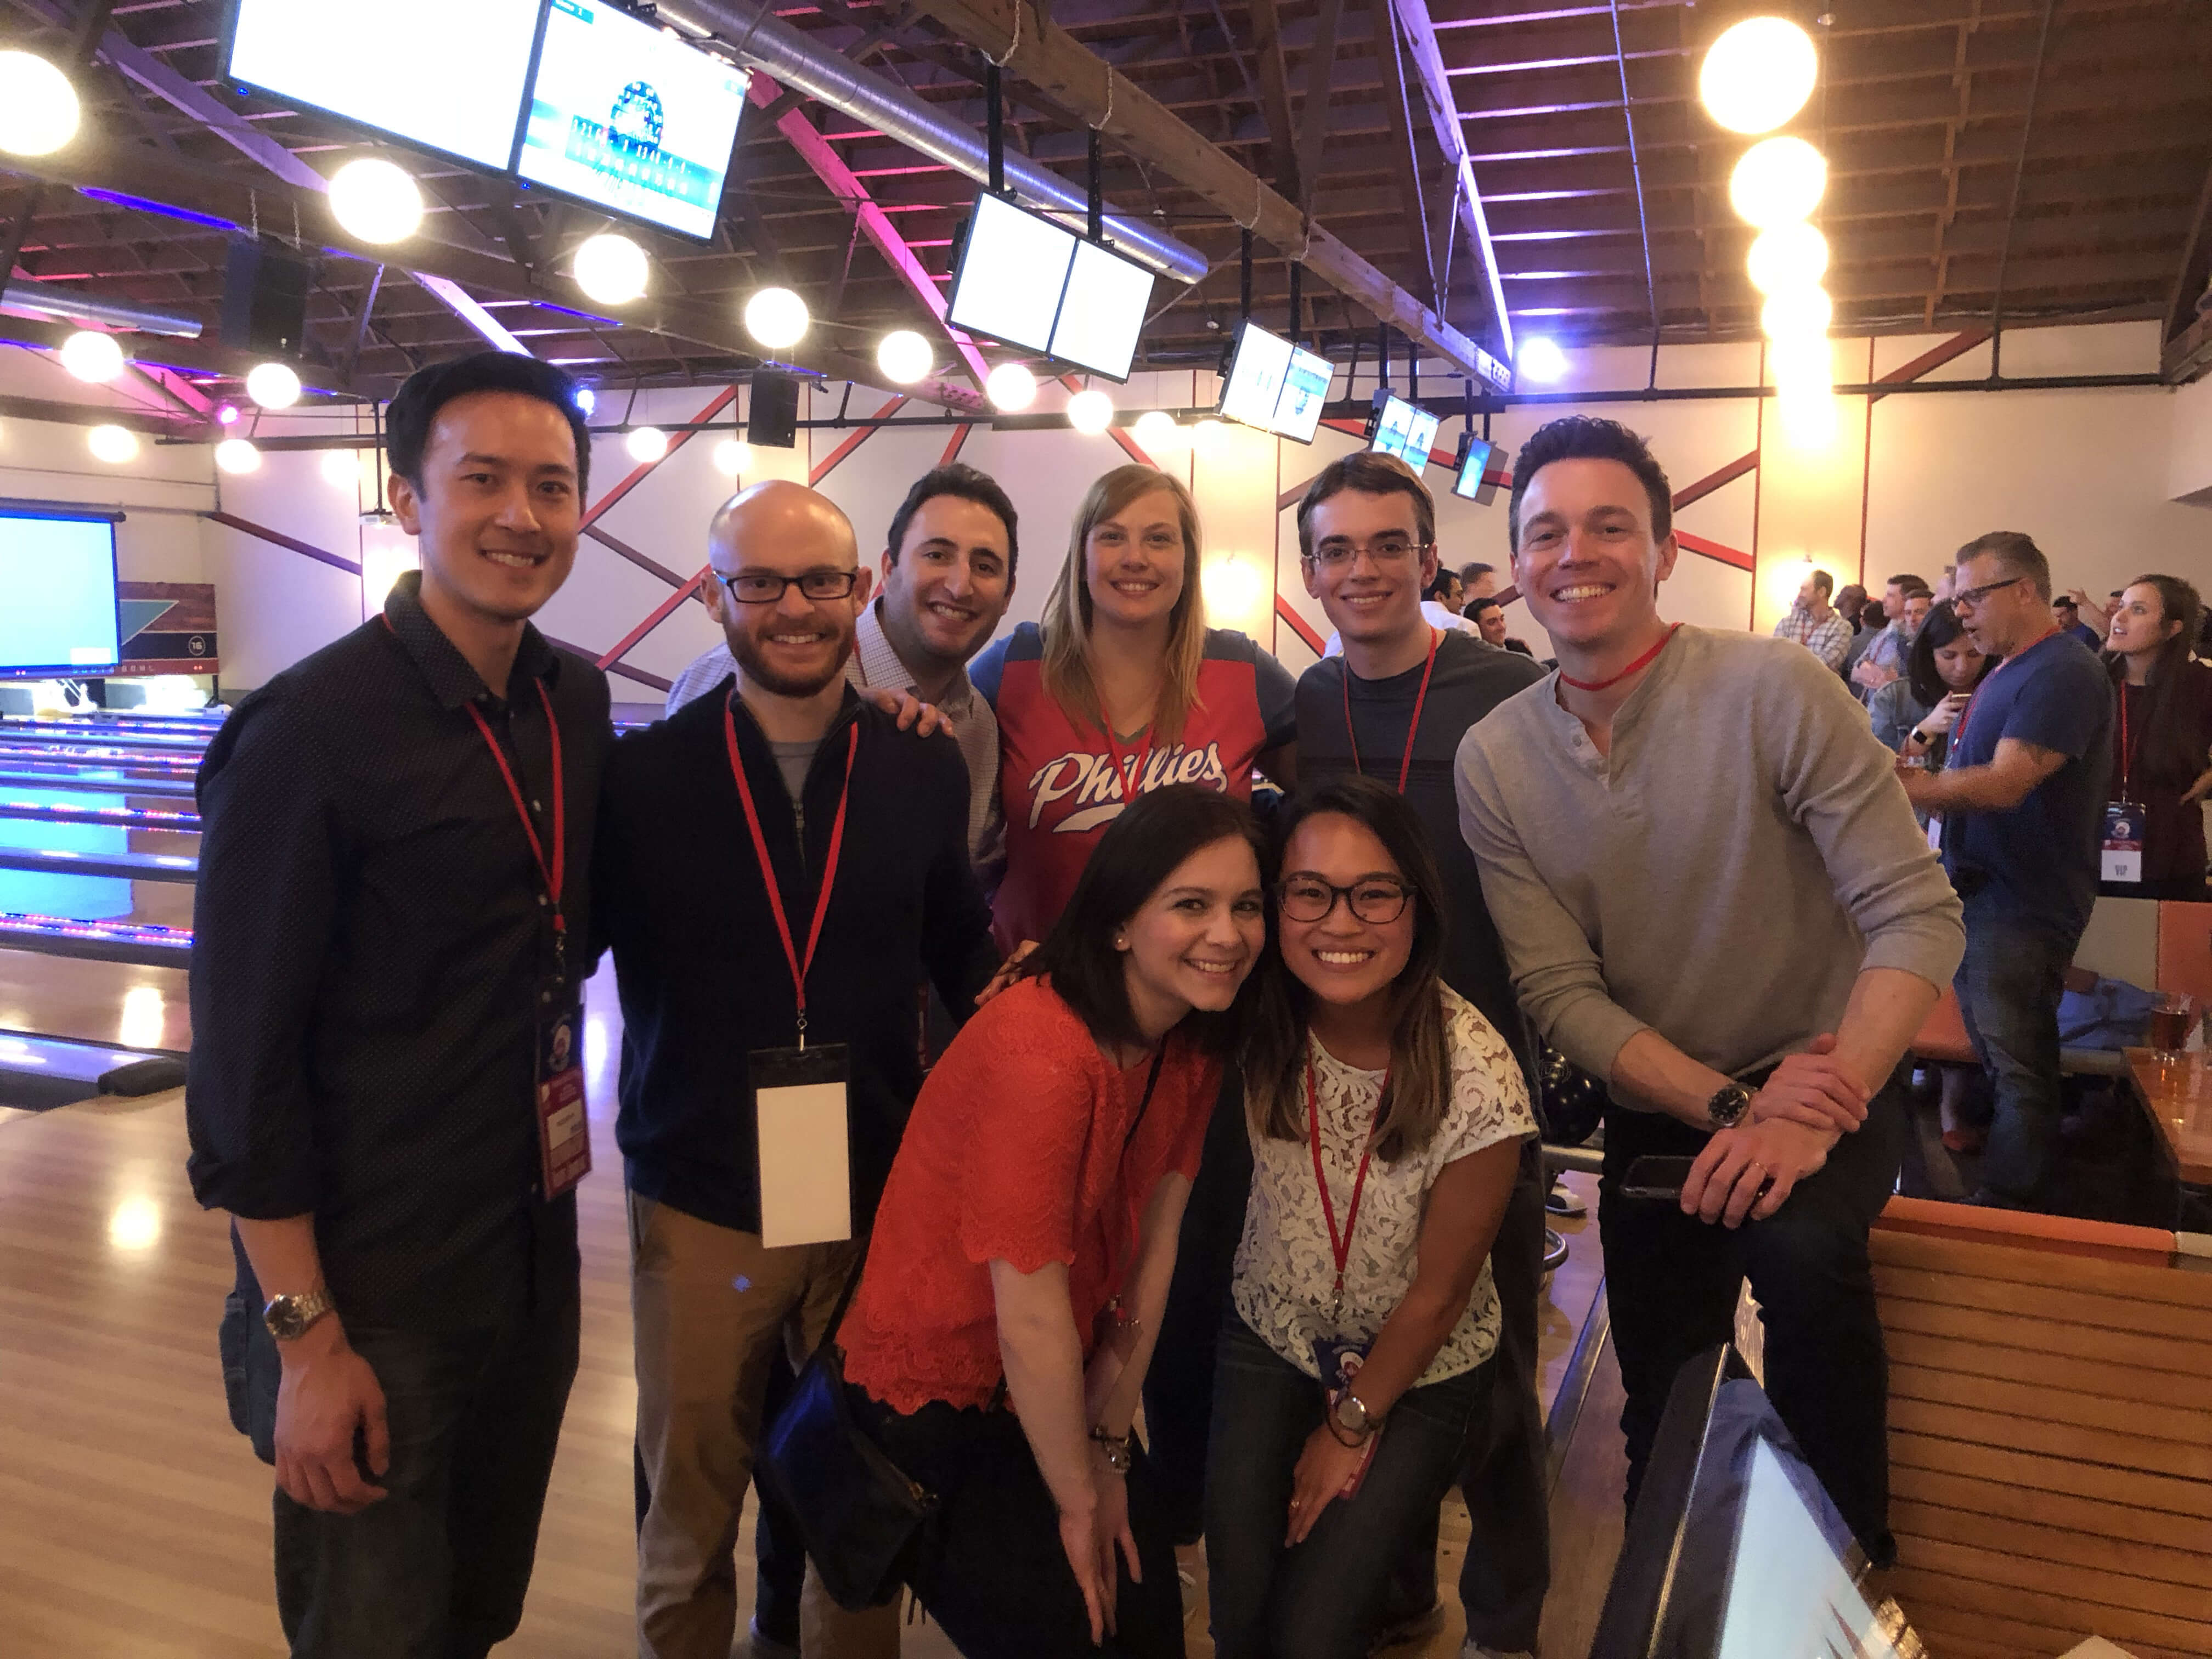 FDP associates posing at a program bowling event